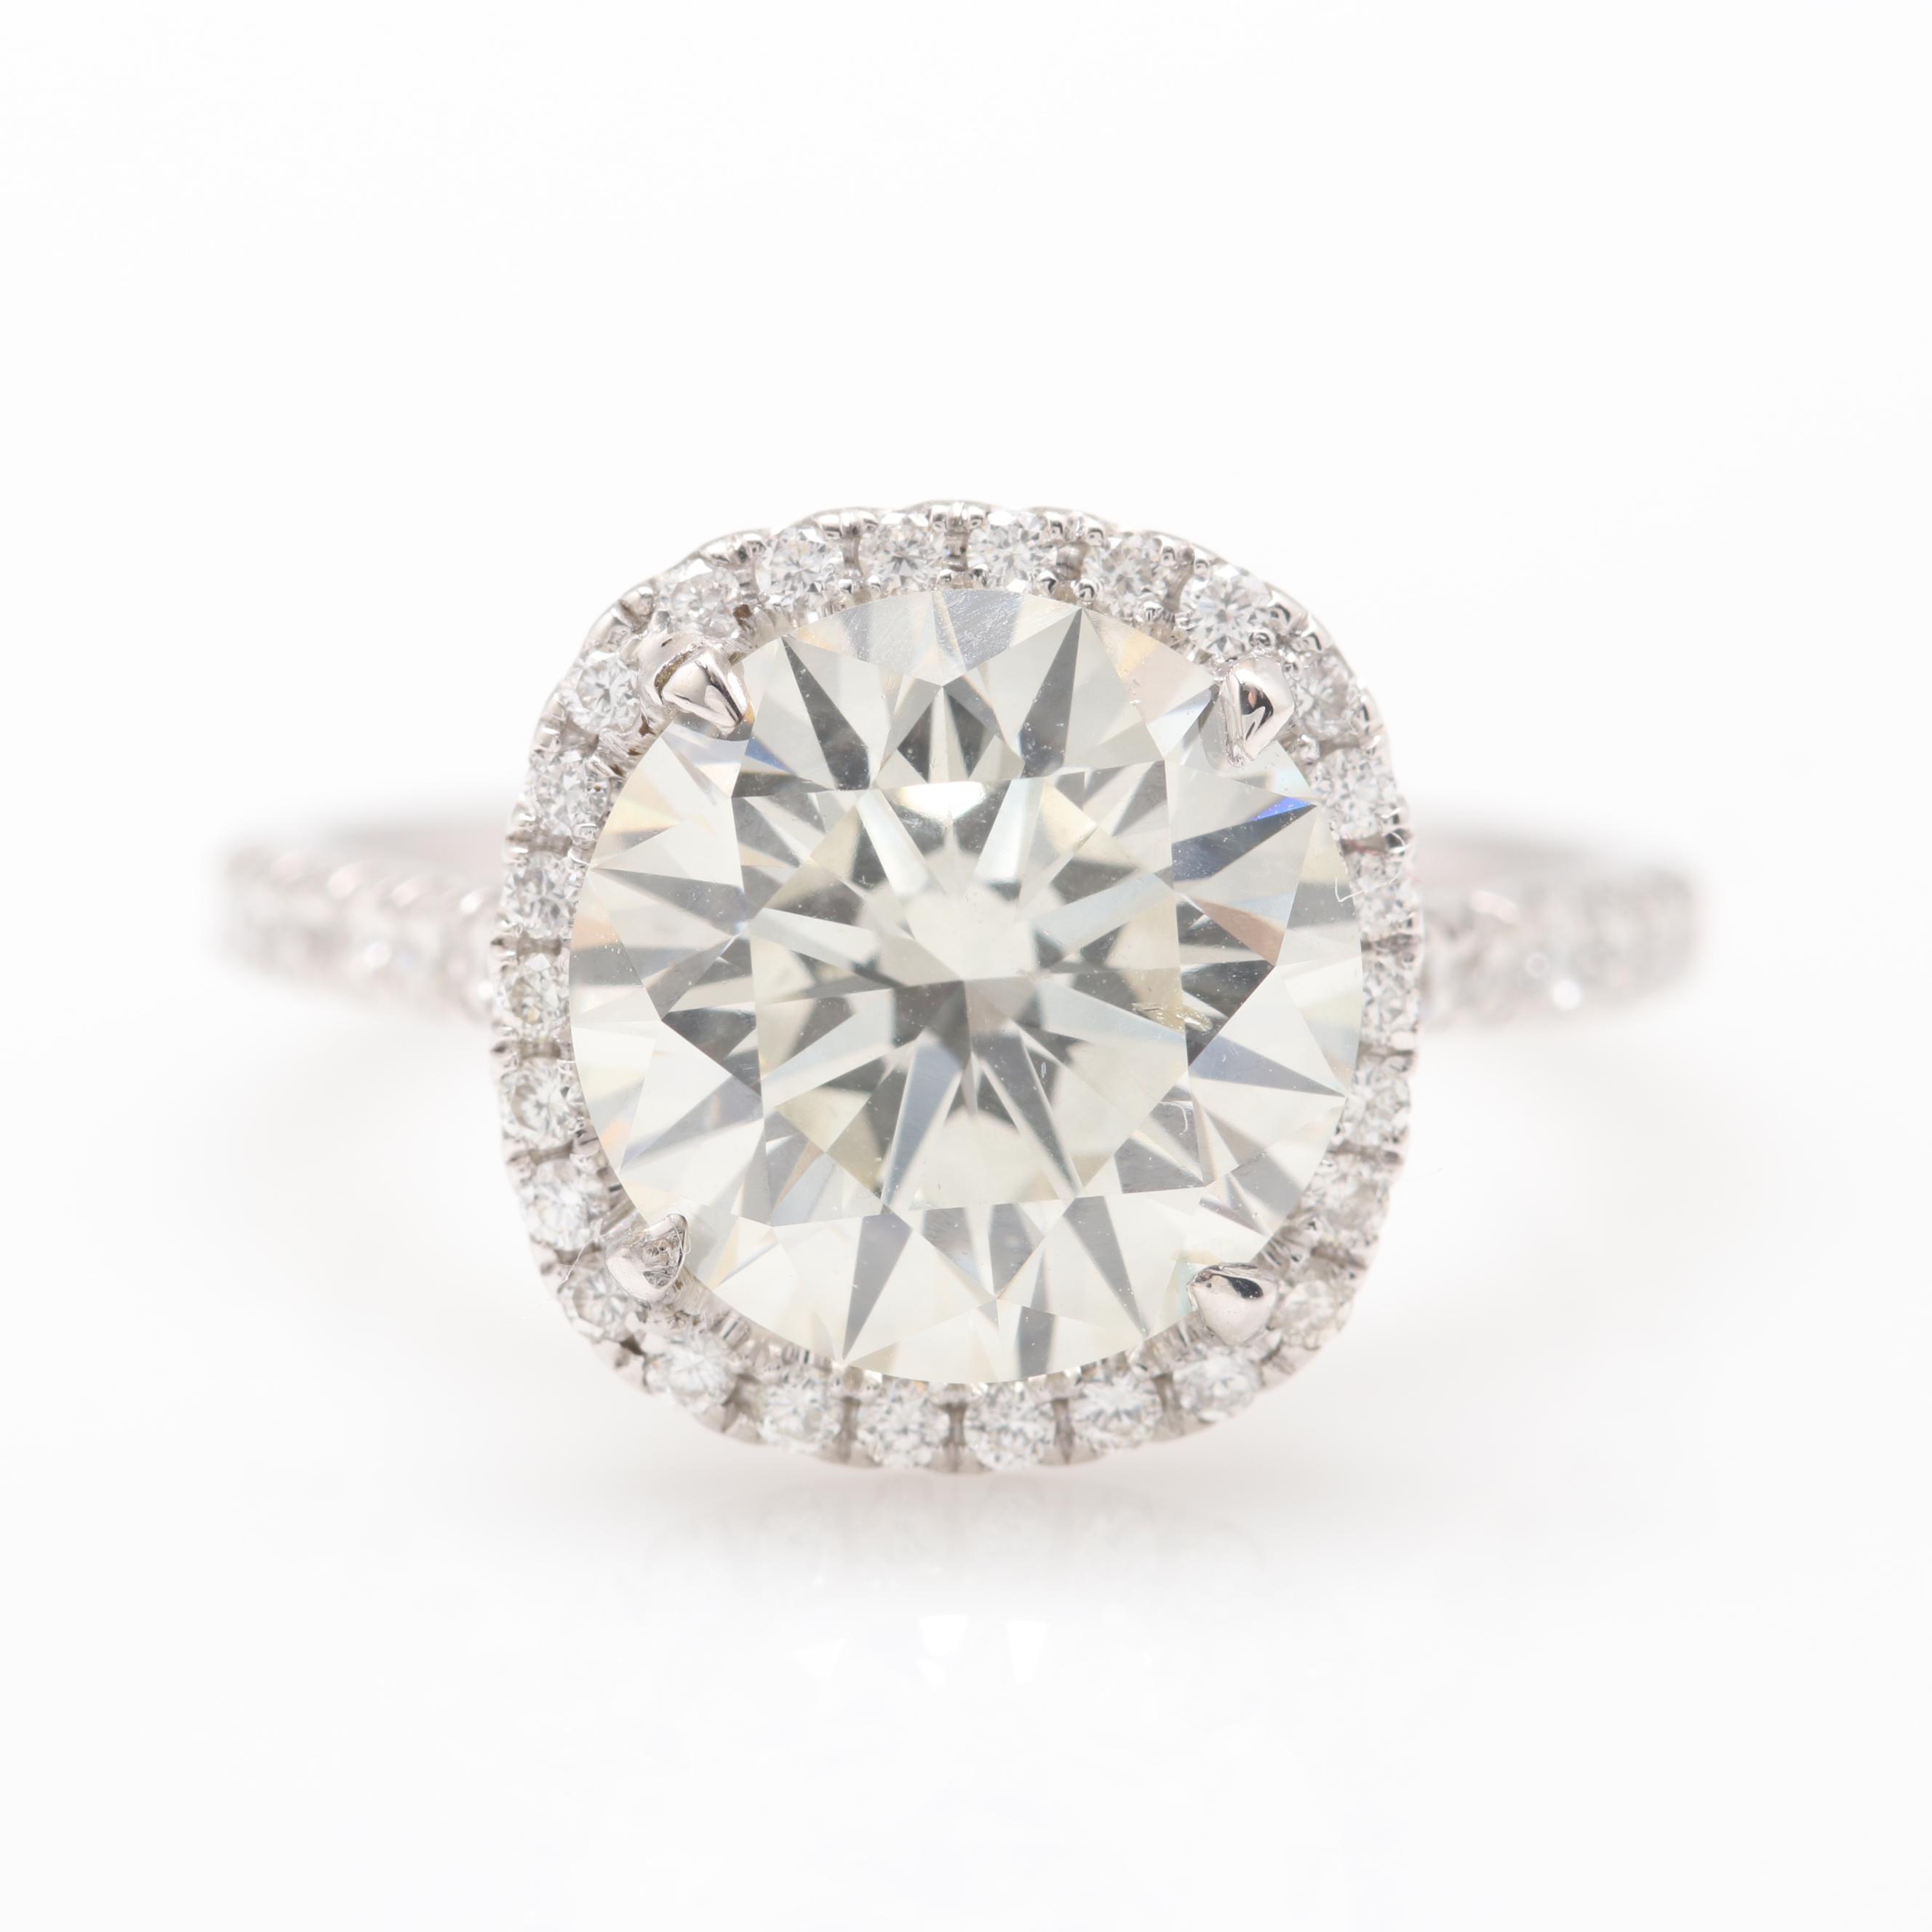 18K White Gold 3.99 CTW Diamond Ring